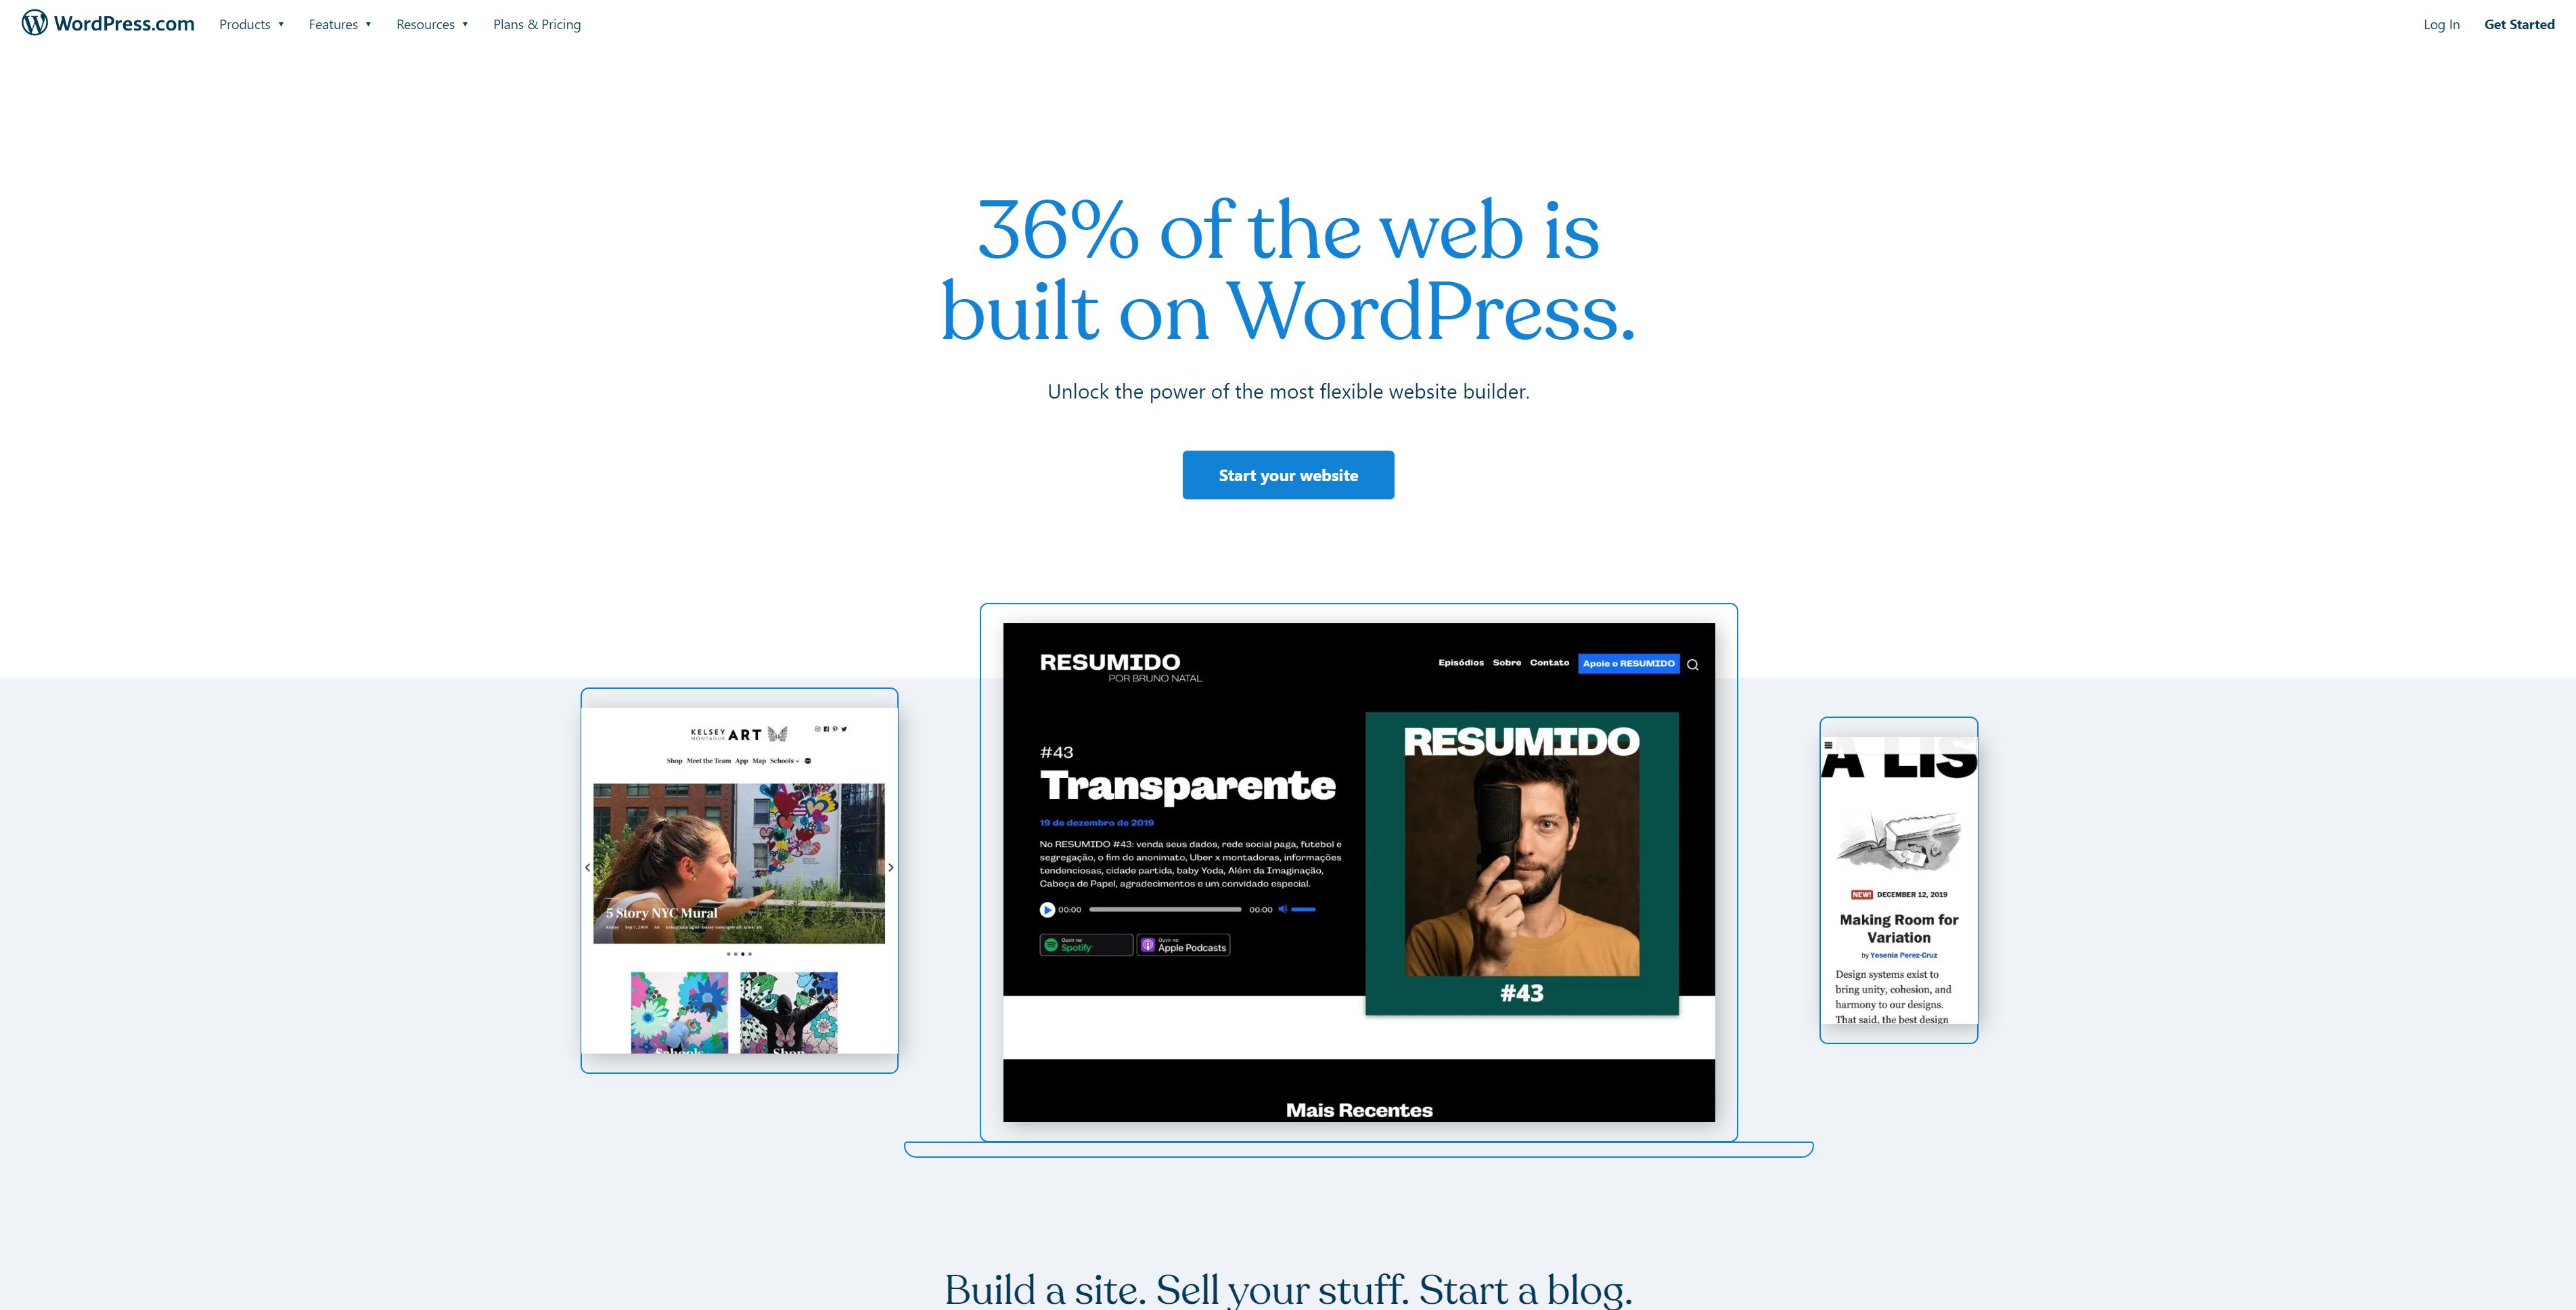 Screenshot showing the website of wordpress.com